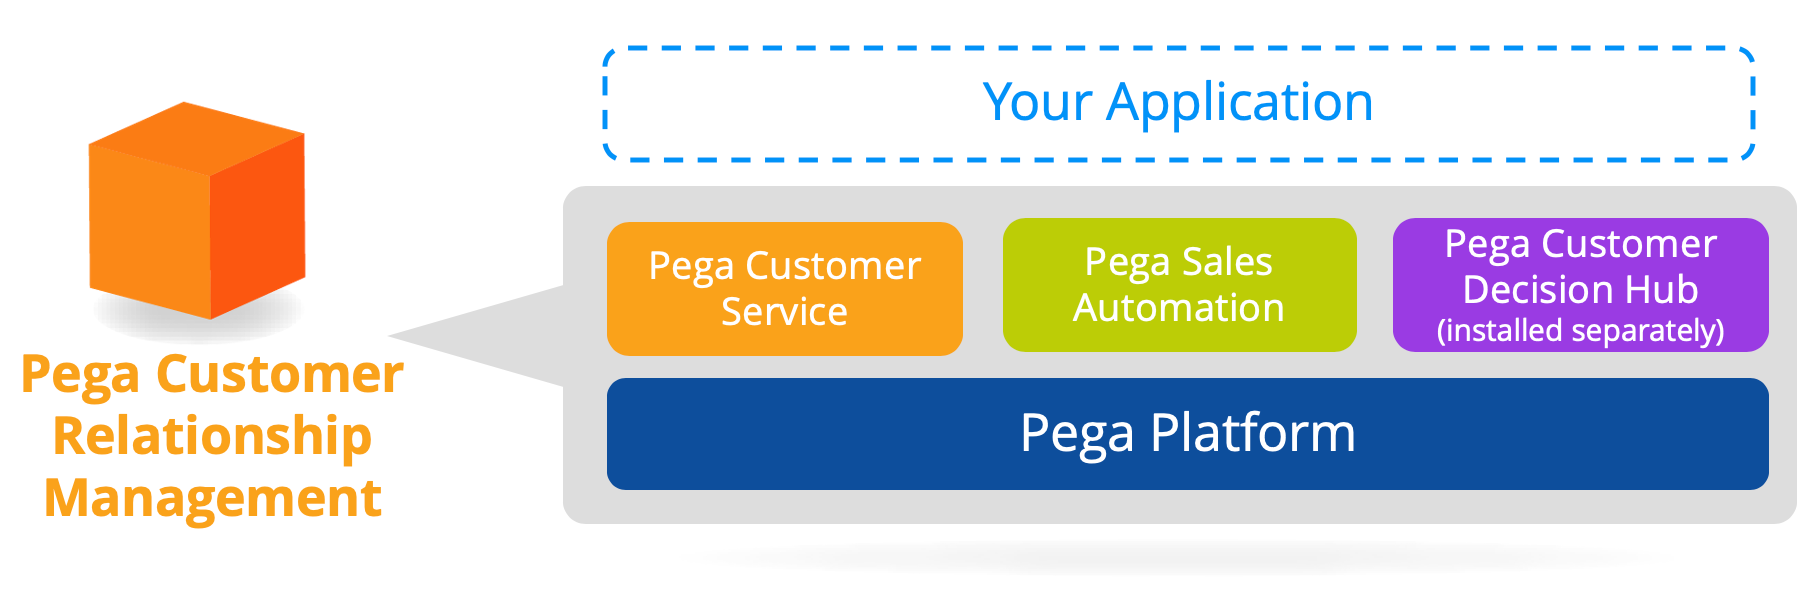 Pega Sales Automation application stack